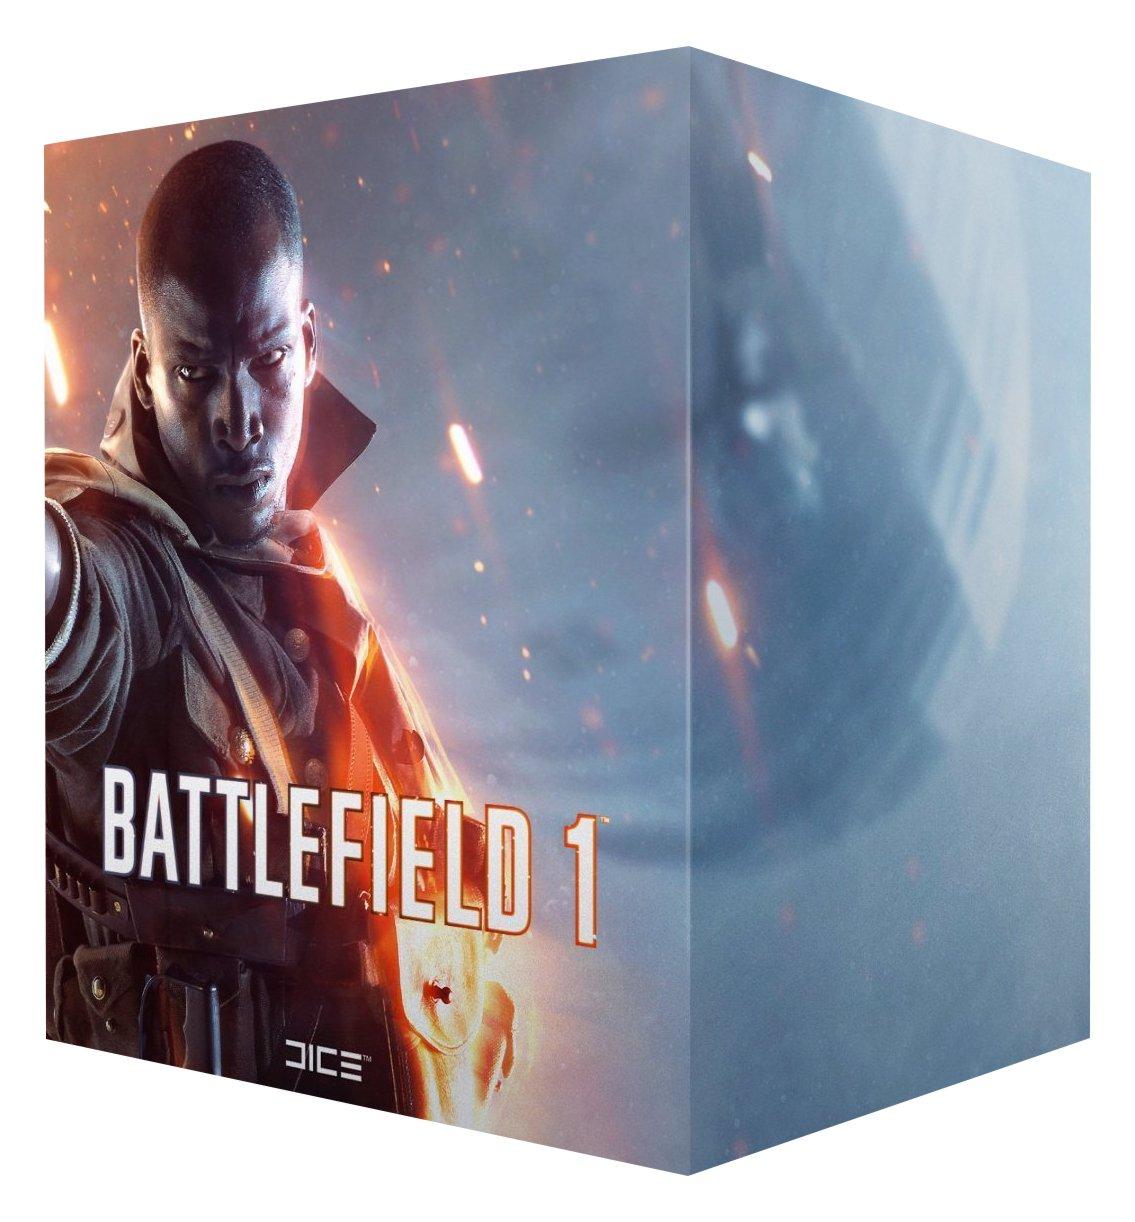 Battlefield Collectors Edition 0859222006037